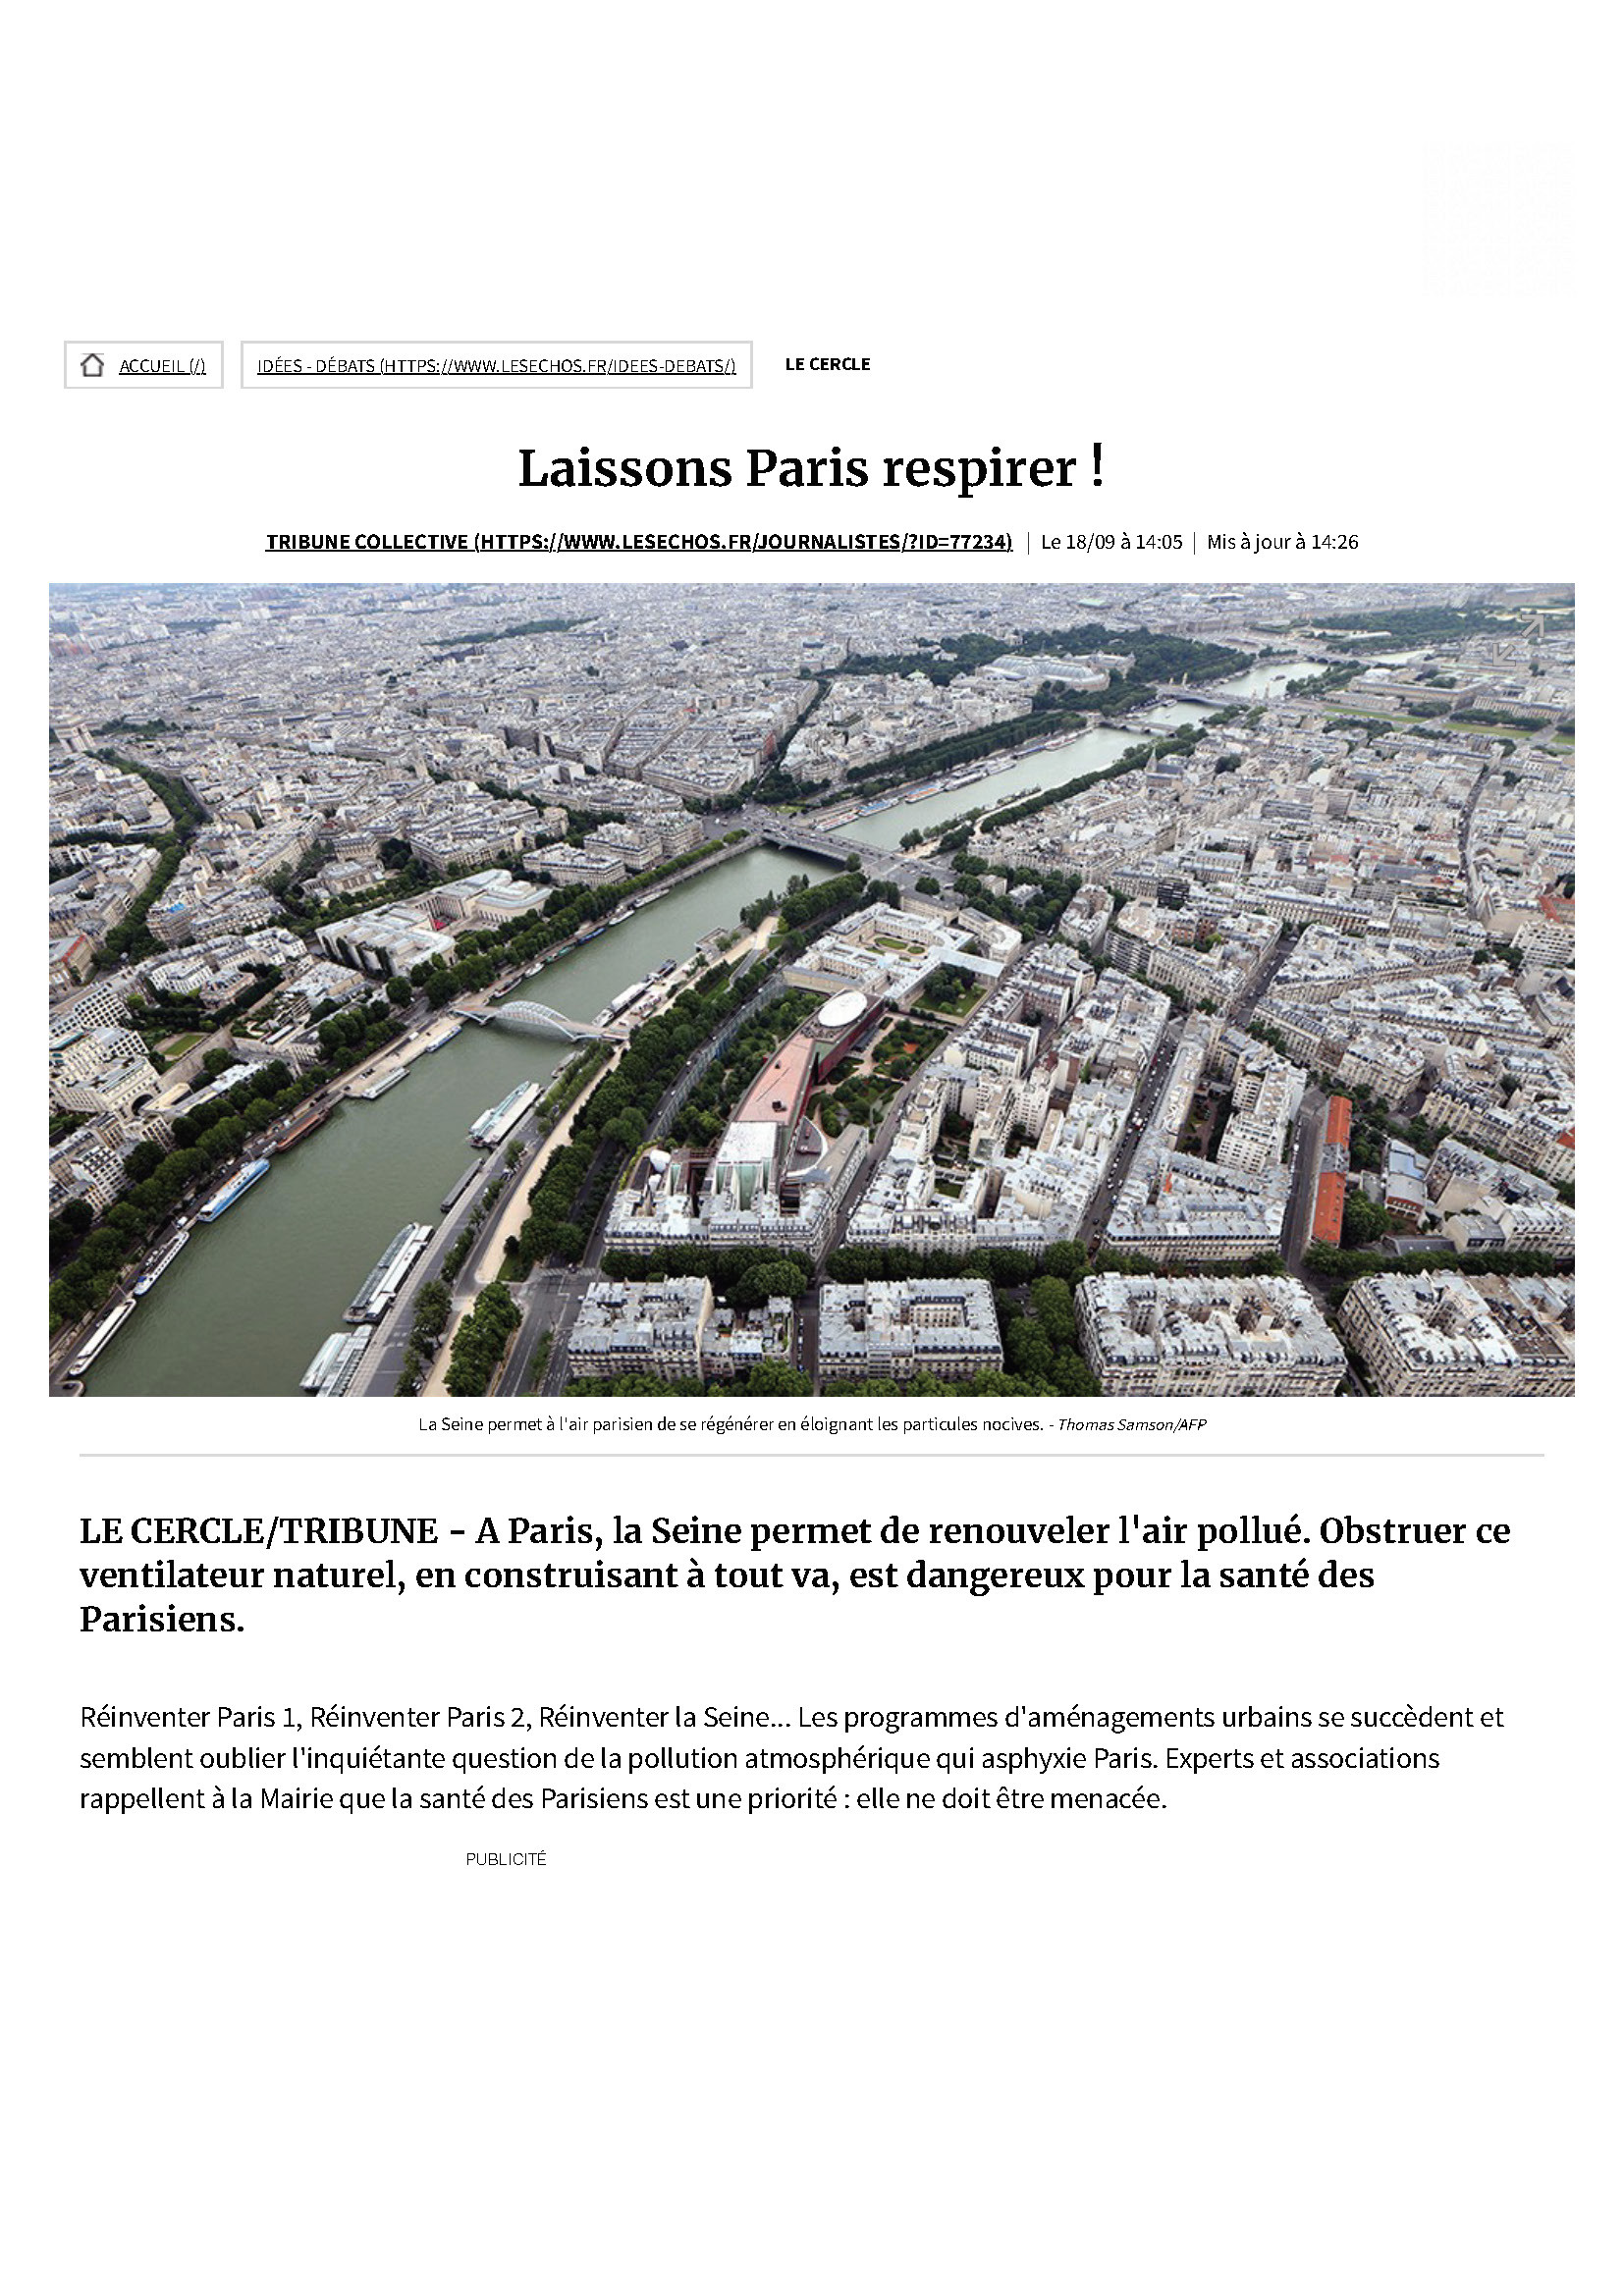 Laissons Paris respirer !_Page_1.jpg